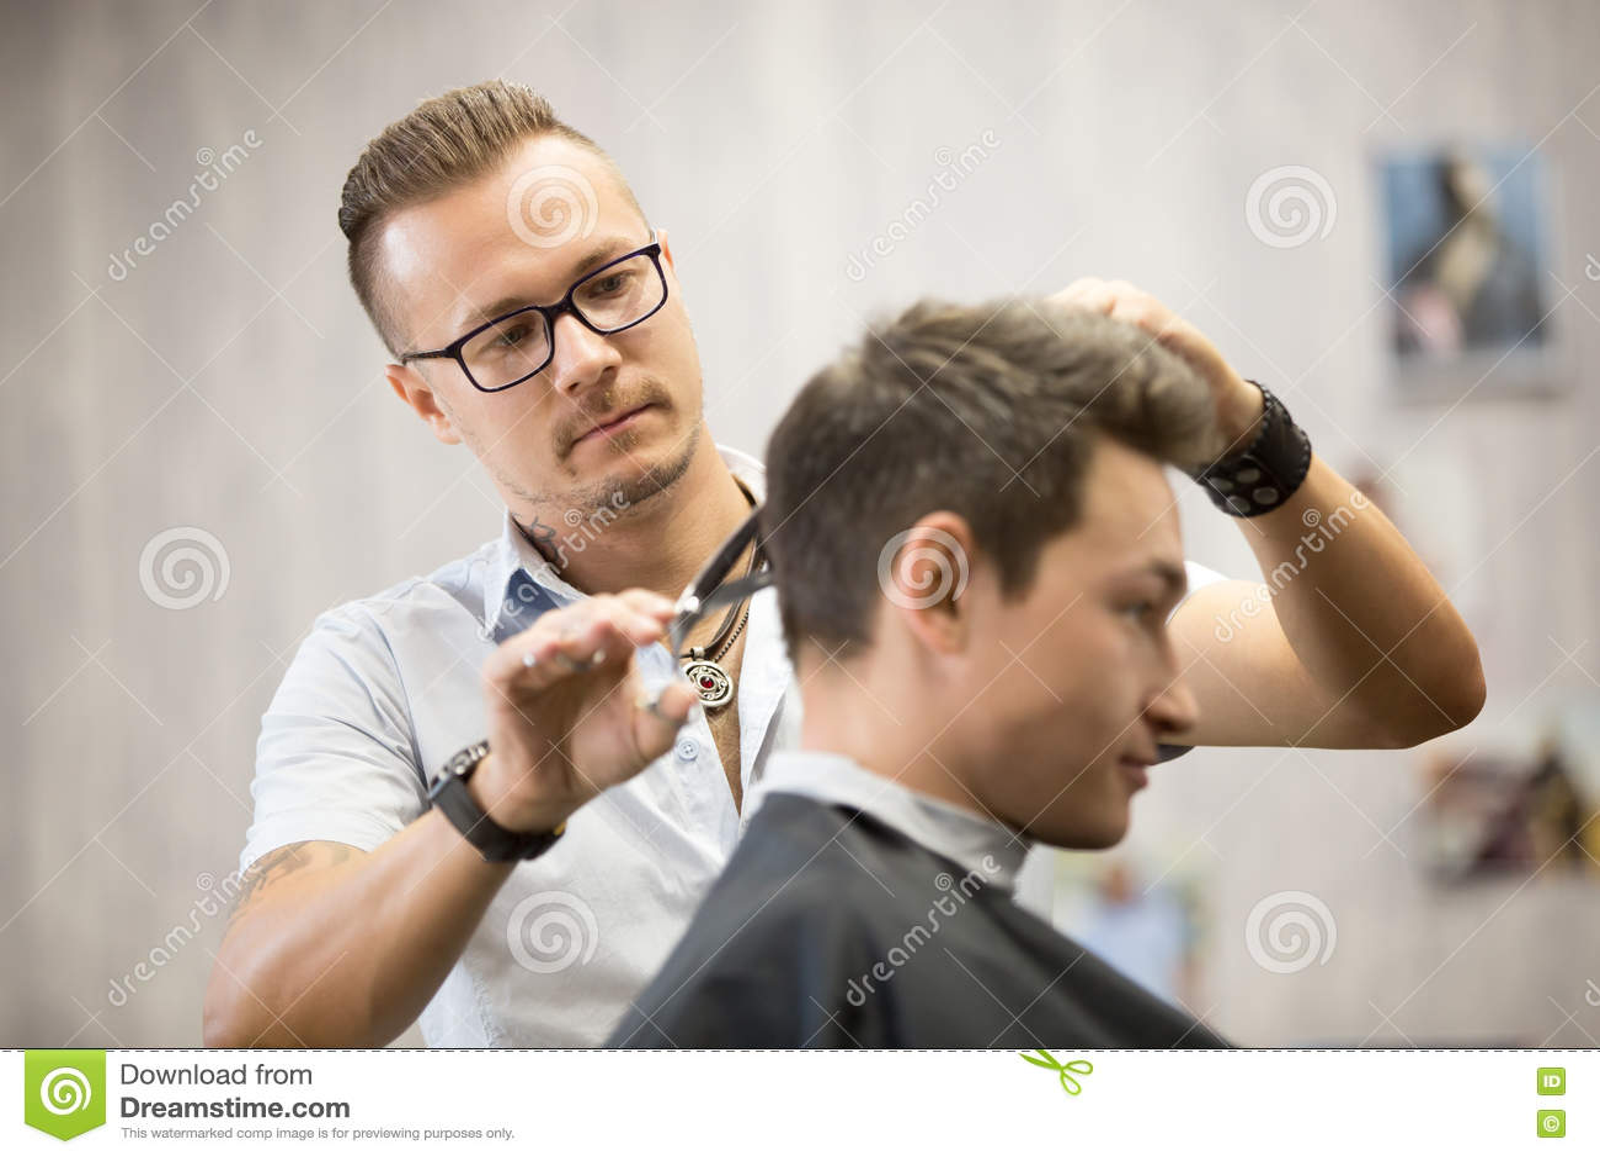 Male hairdresser making haircut